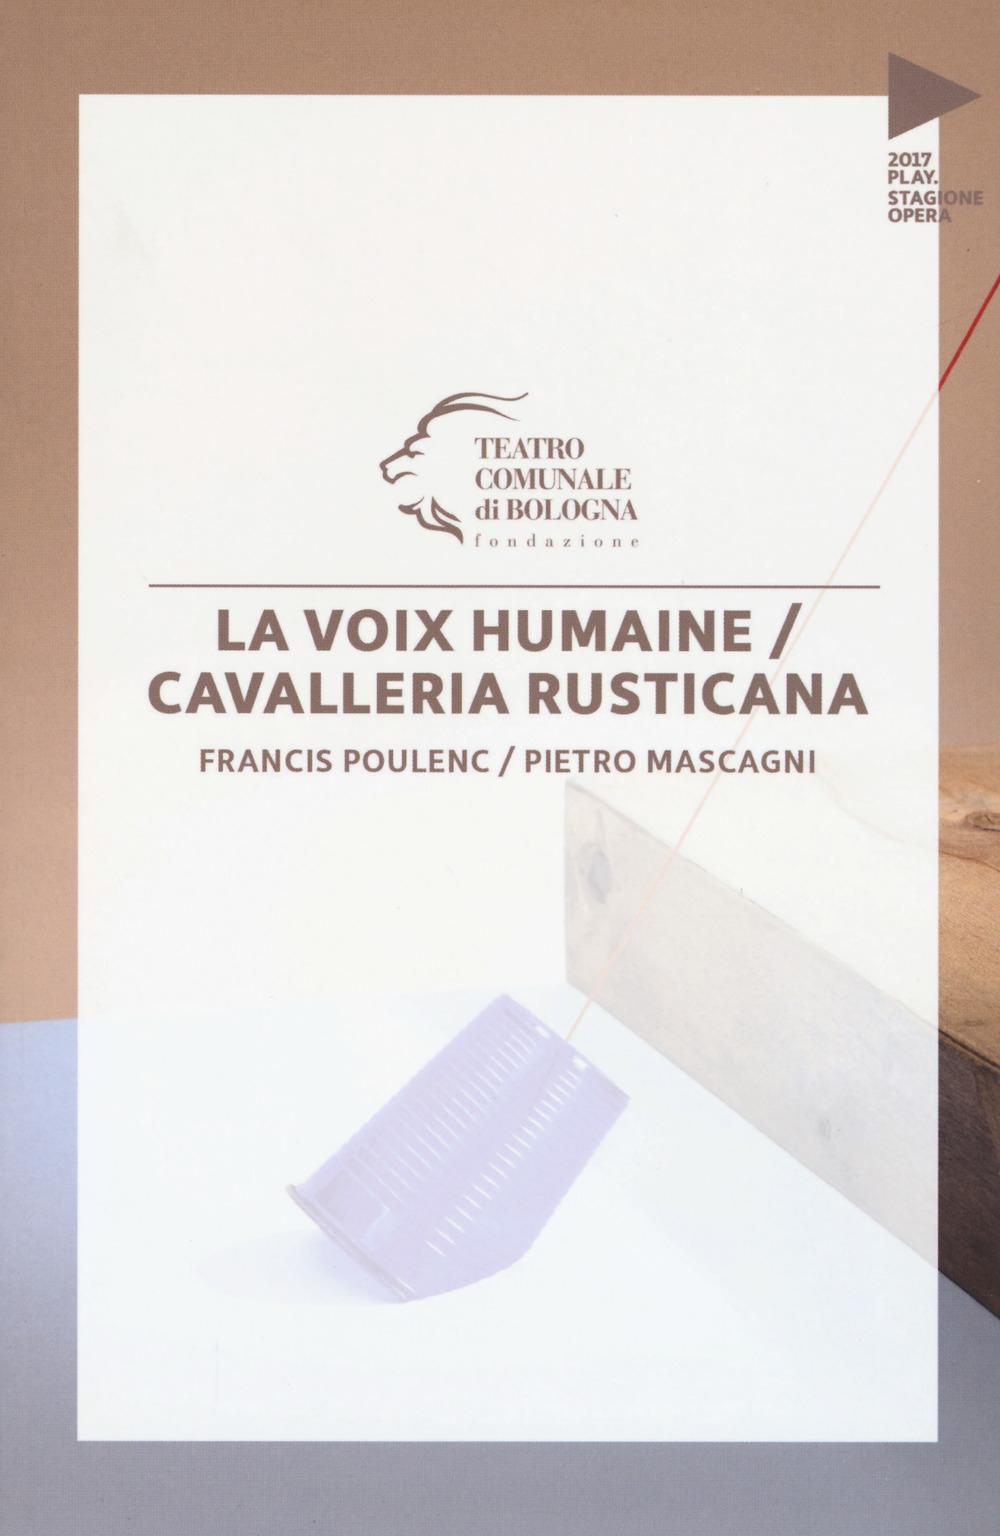 Francis Poulenc. Pietro Mascagni. La voix humaine. Cavalleria rusticana